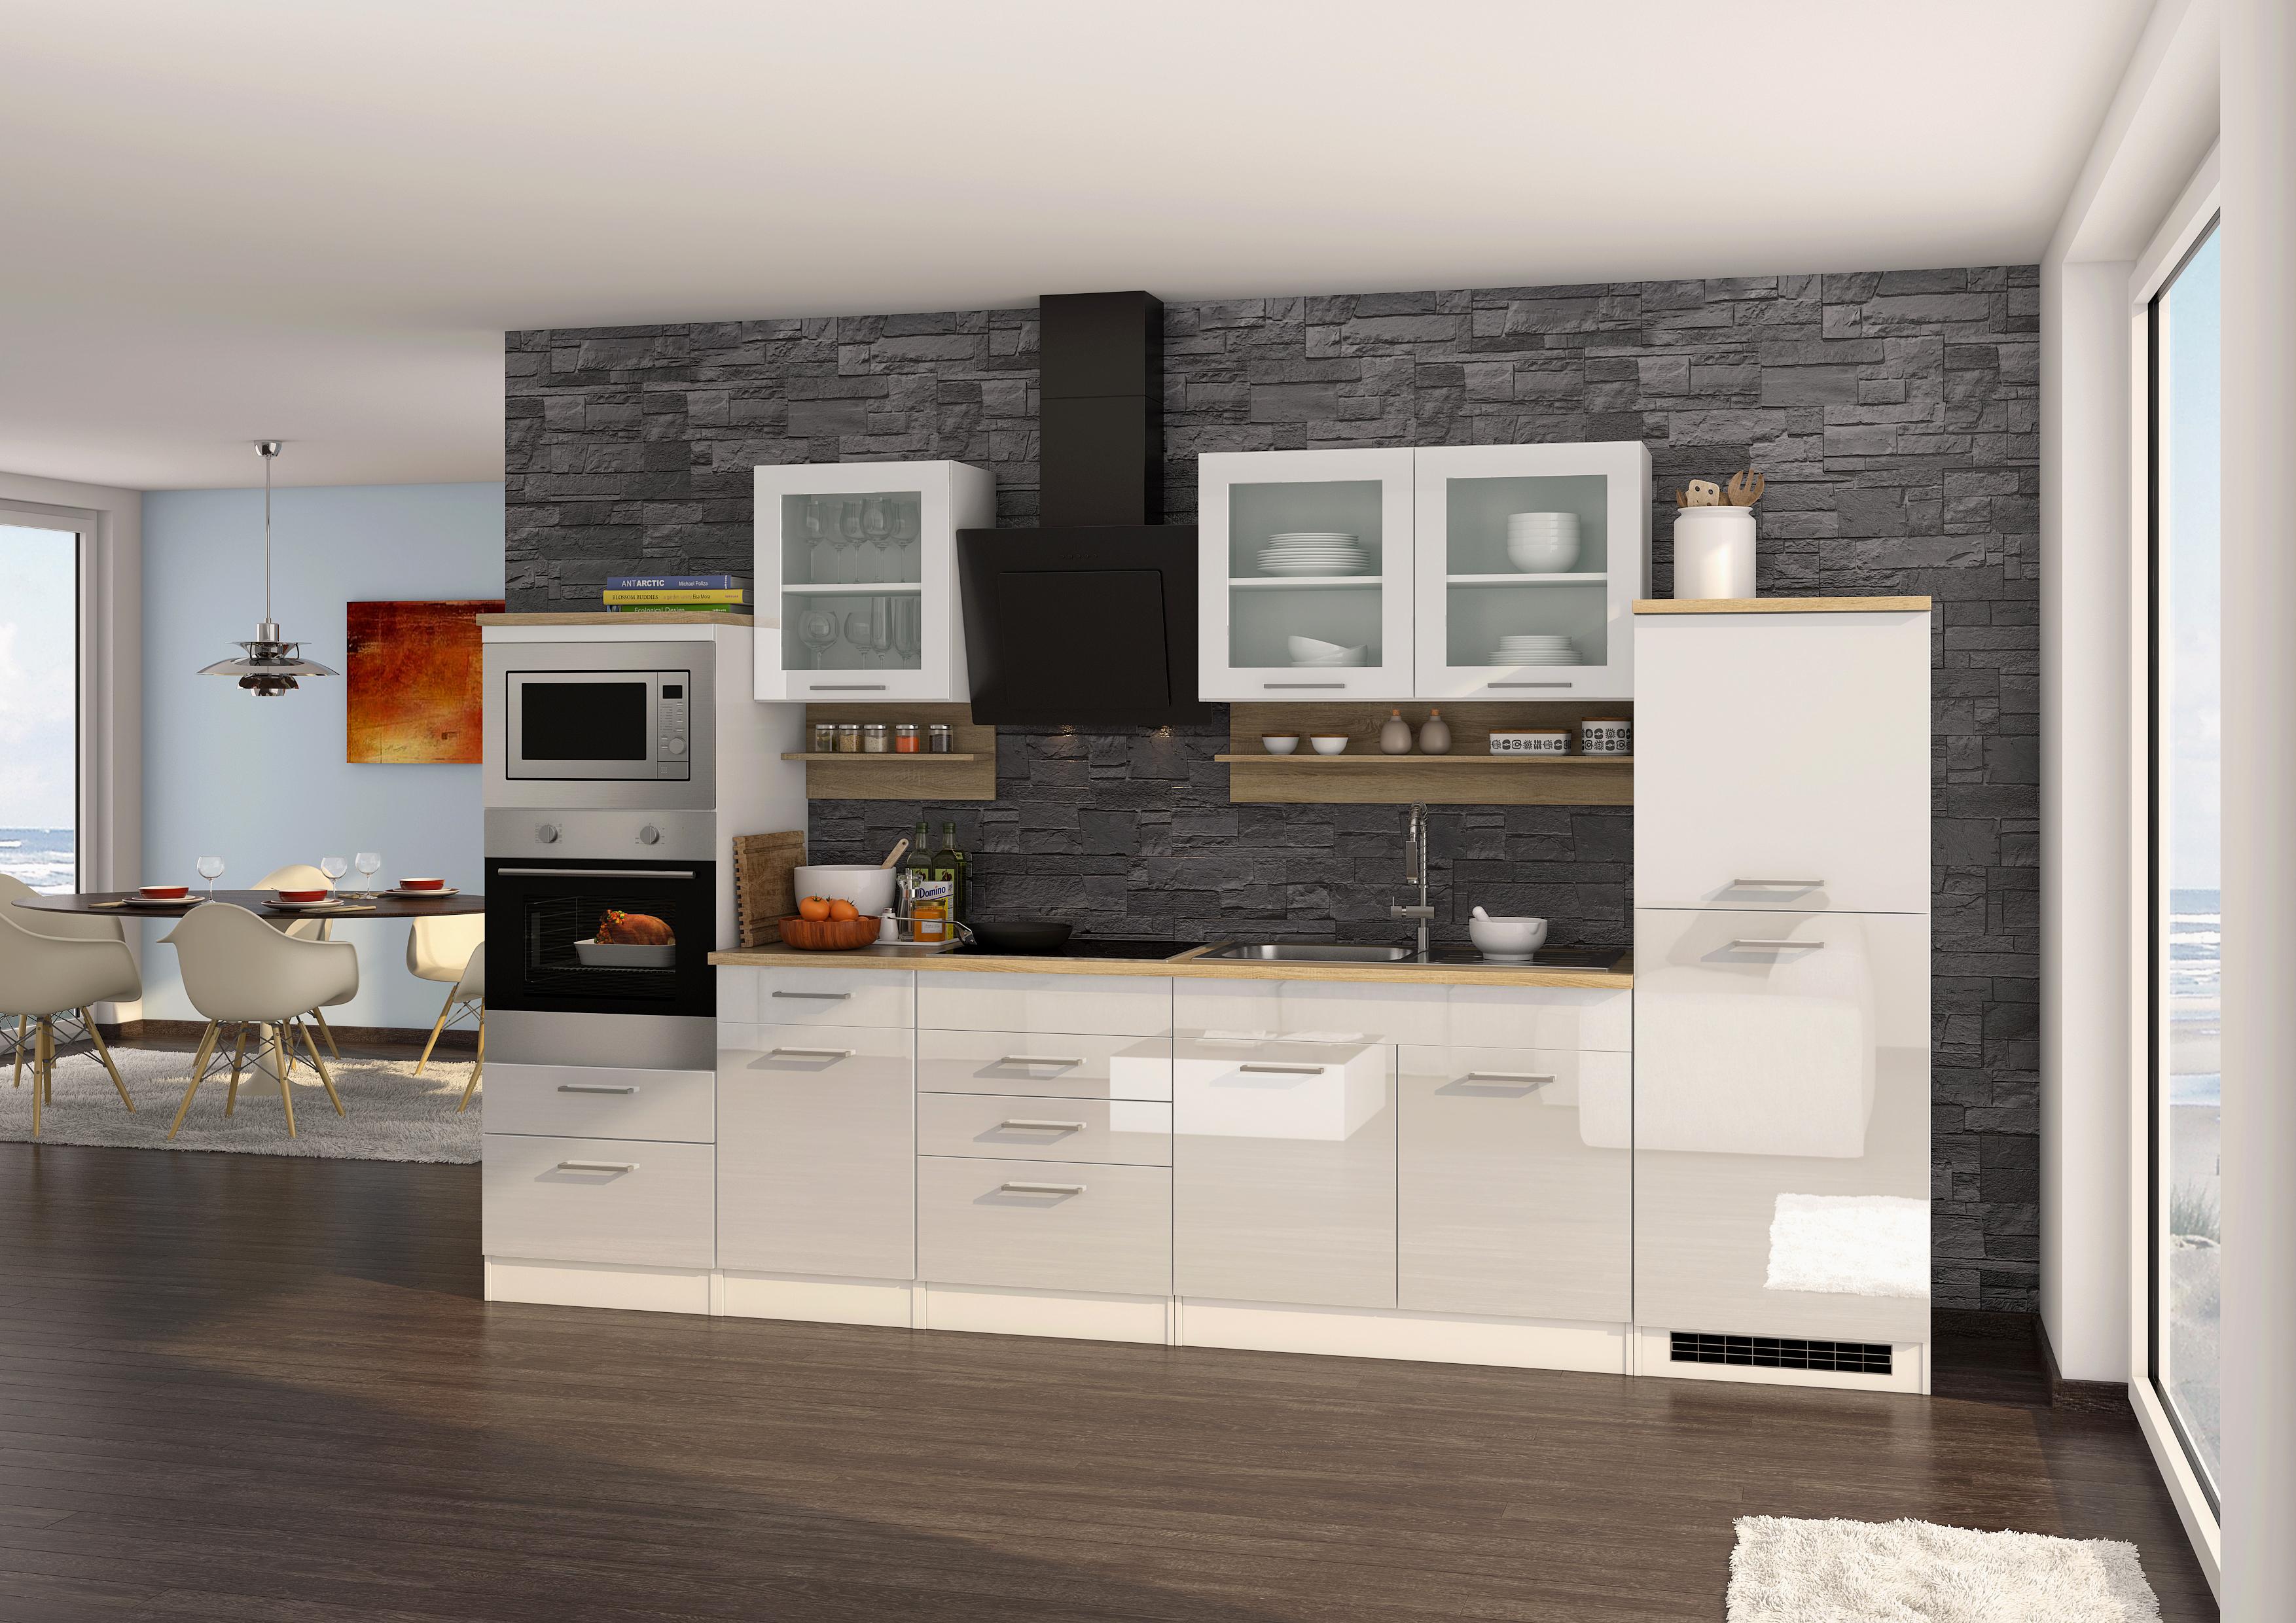 Küchenblock inkl E-Geräte 330 cm breit MAILAND ...